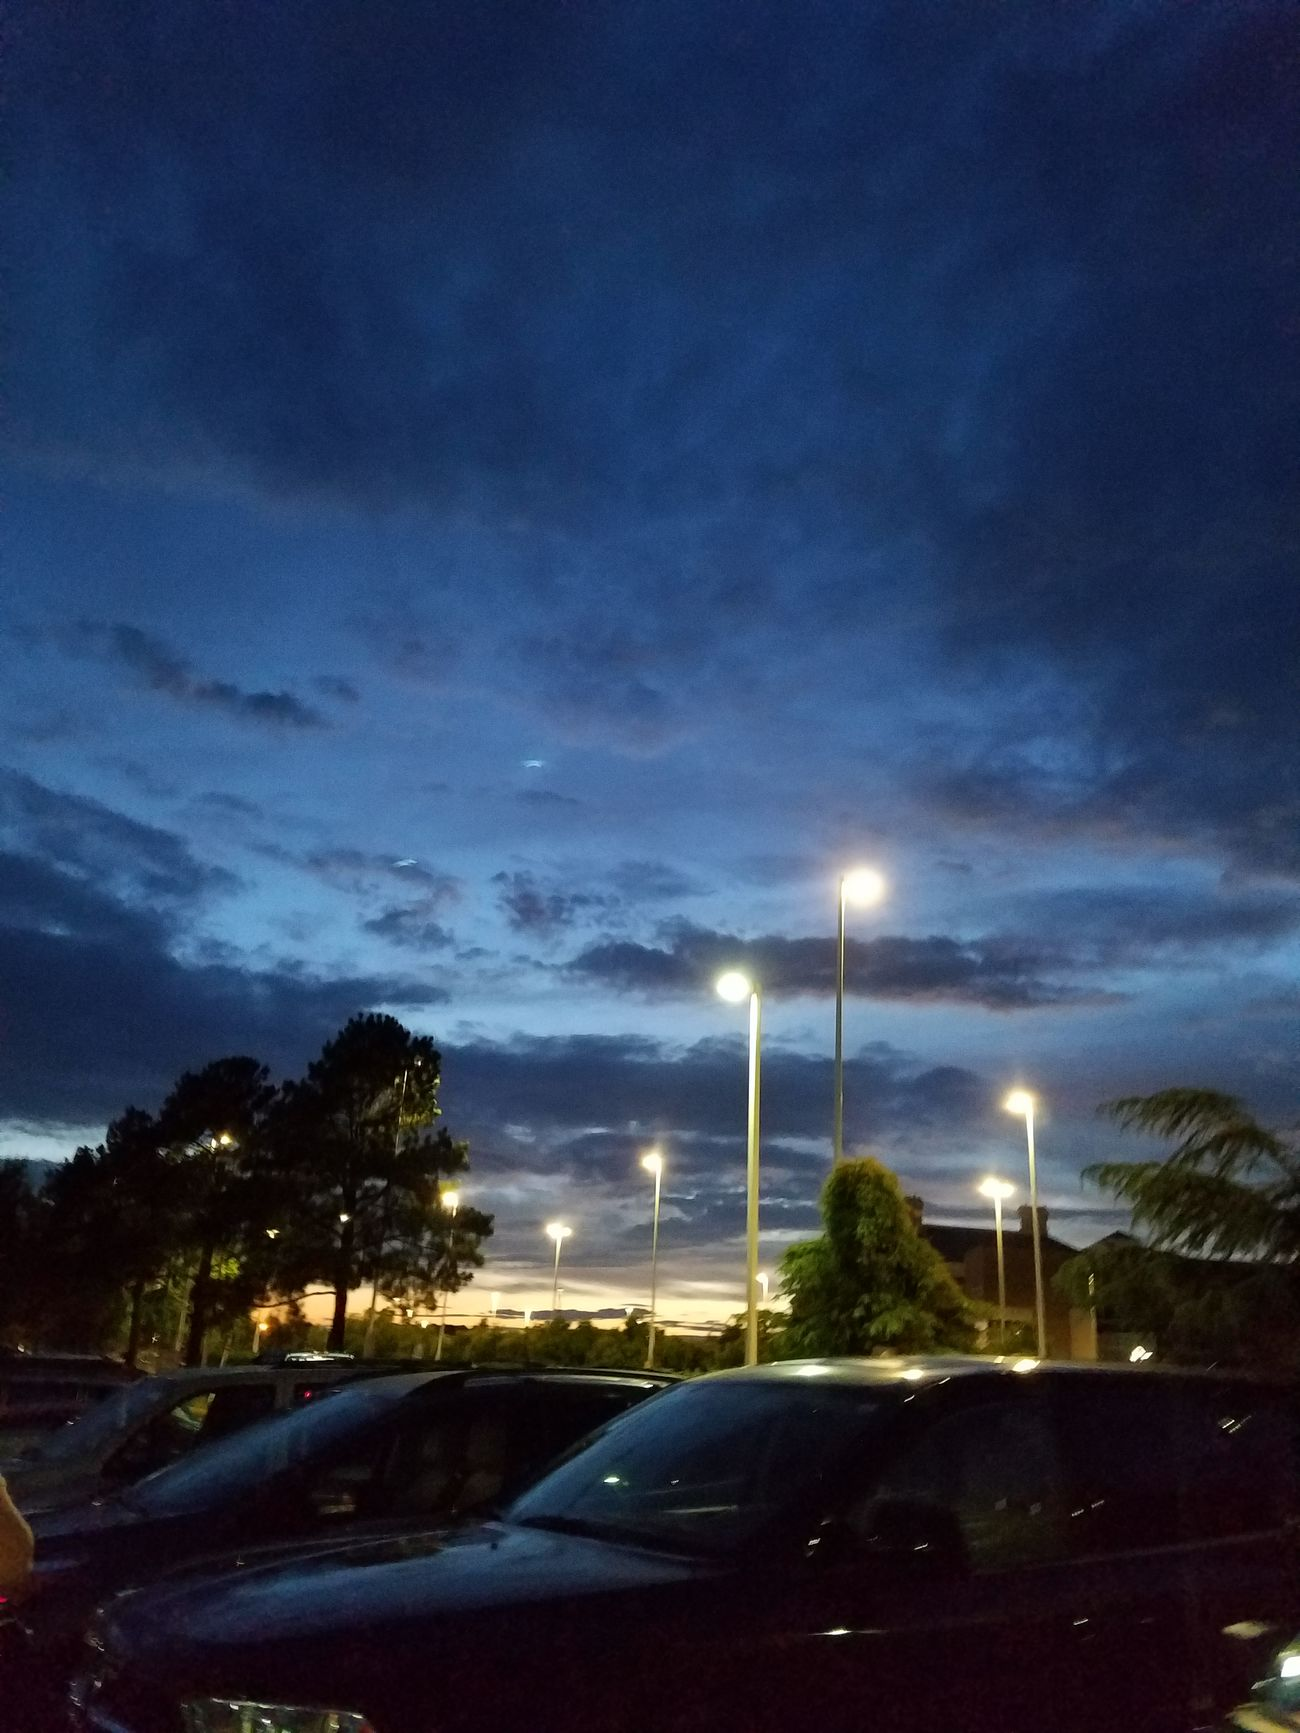 Night Skies Ujustgotkaied Night Cityscape Lights Sky Evening